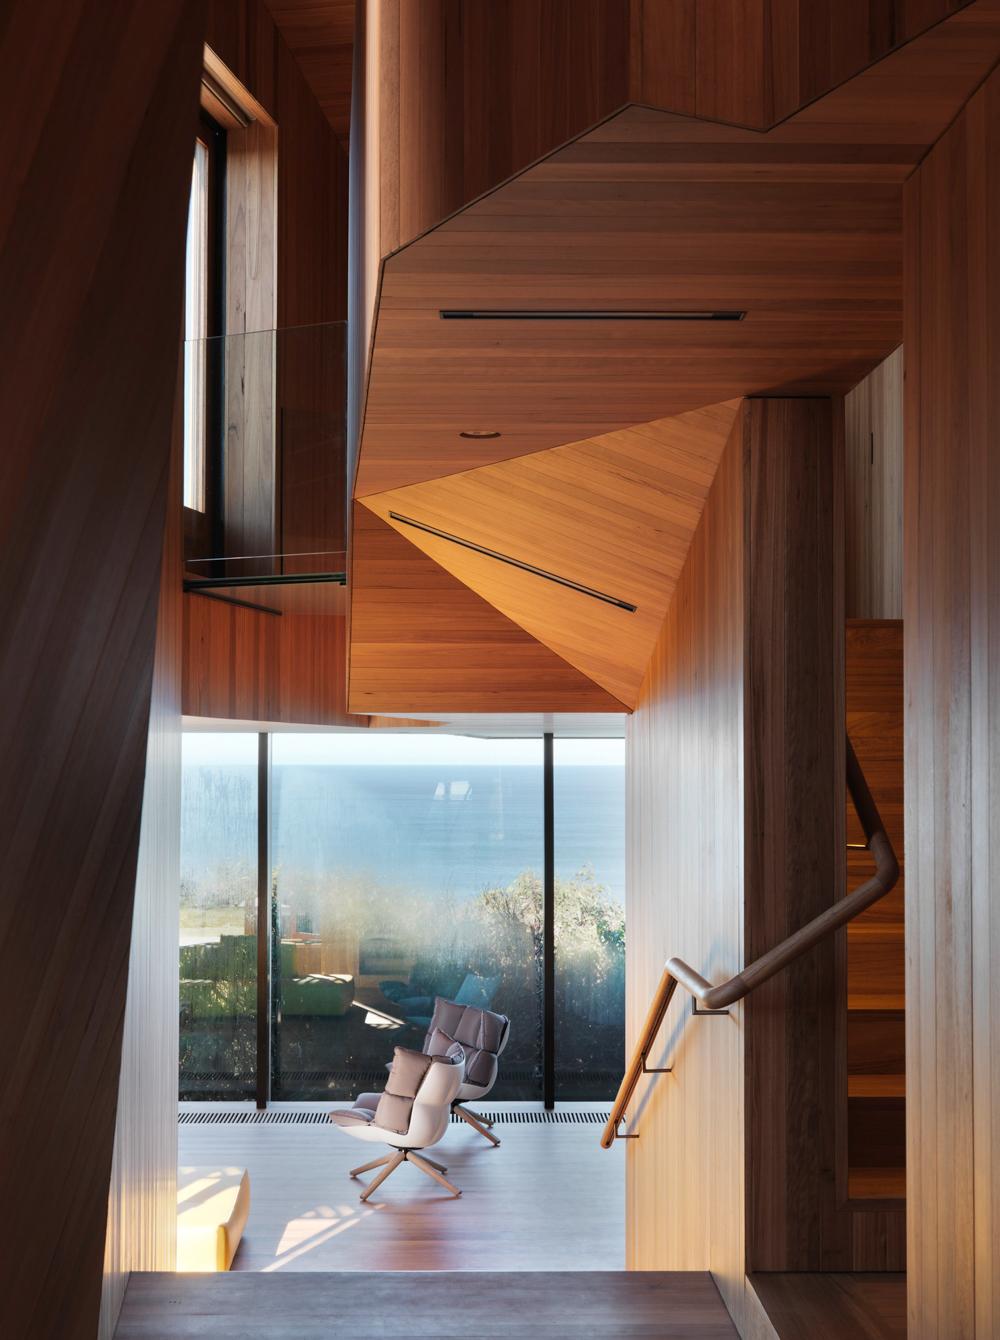 fairhaven-beach-house-john-wardle-architects-the-design-emotive-04.jpg